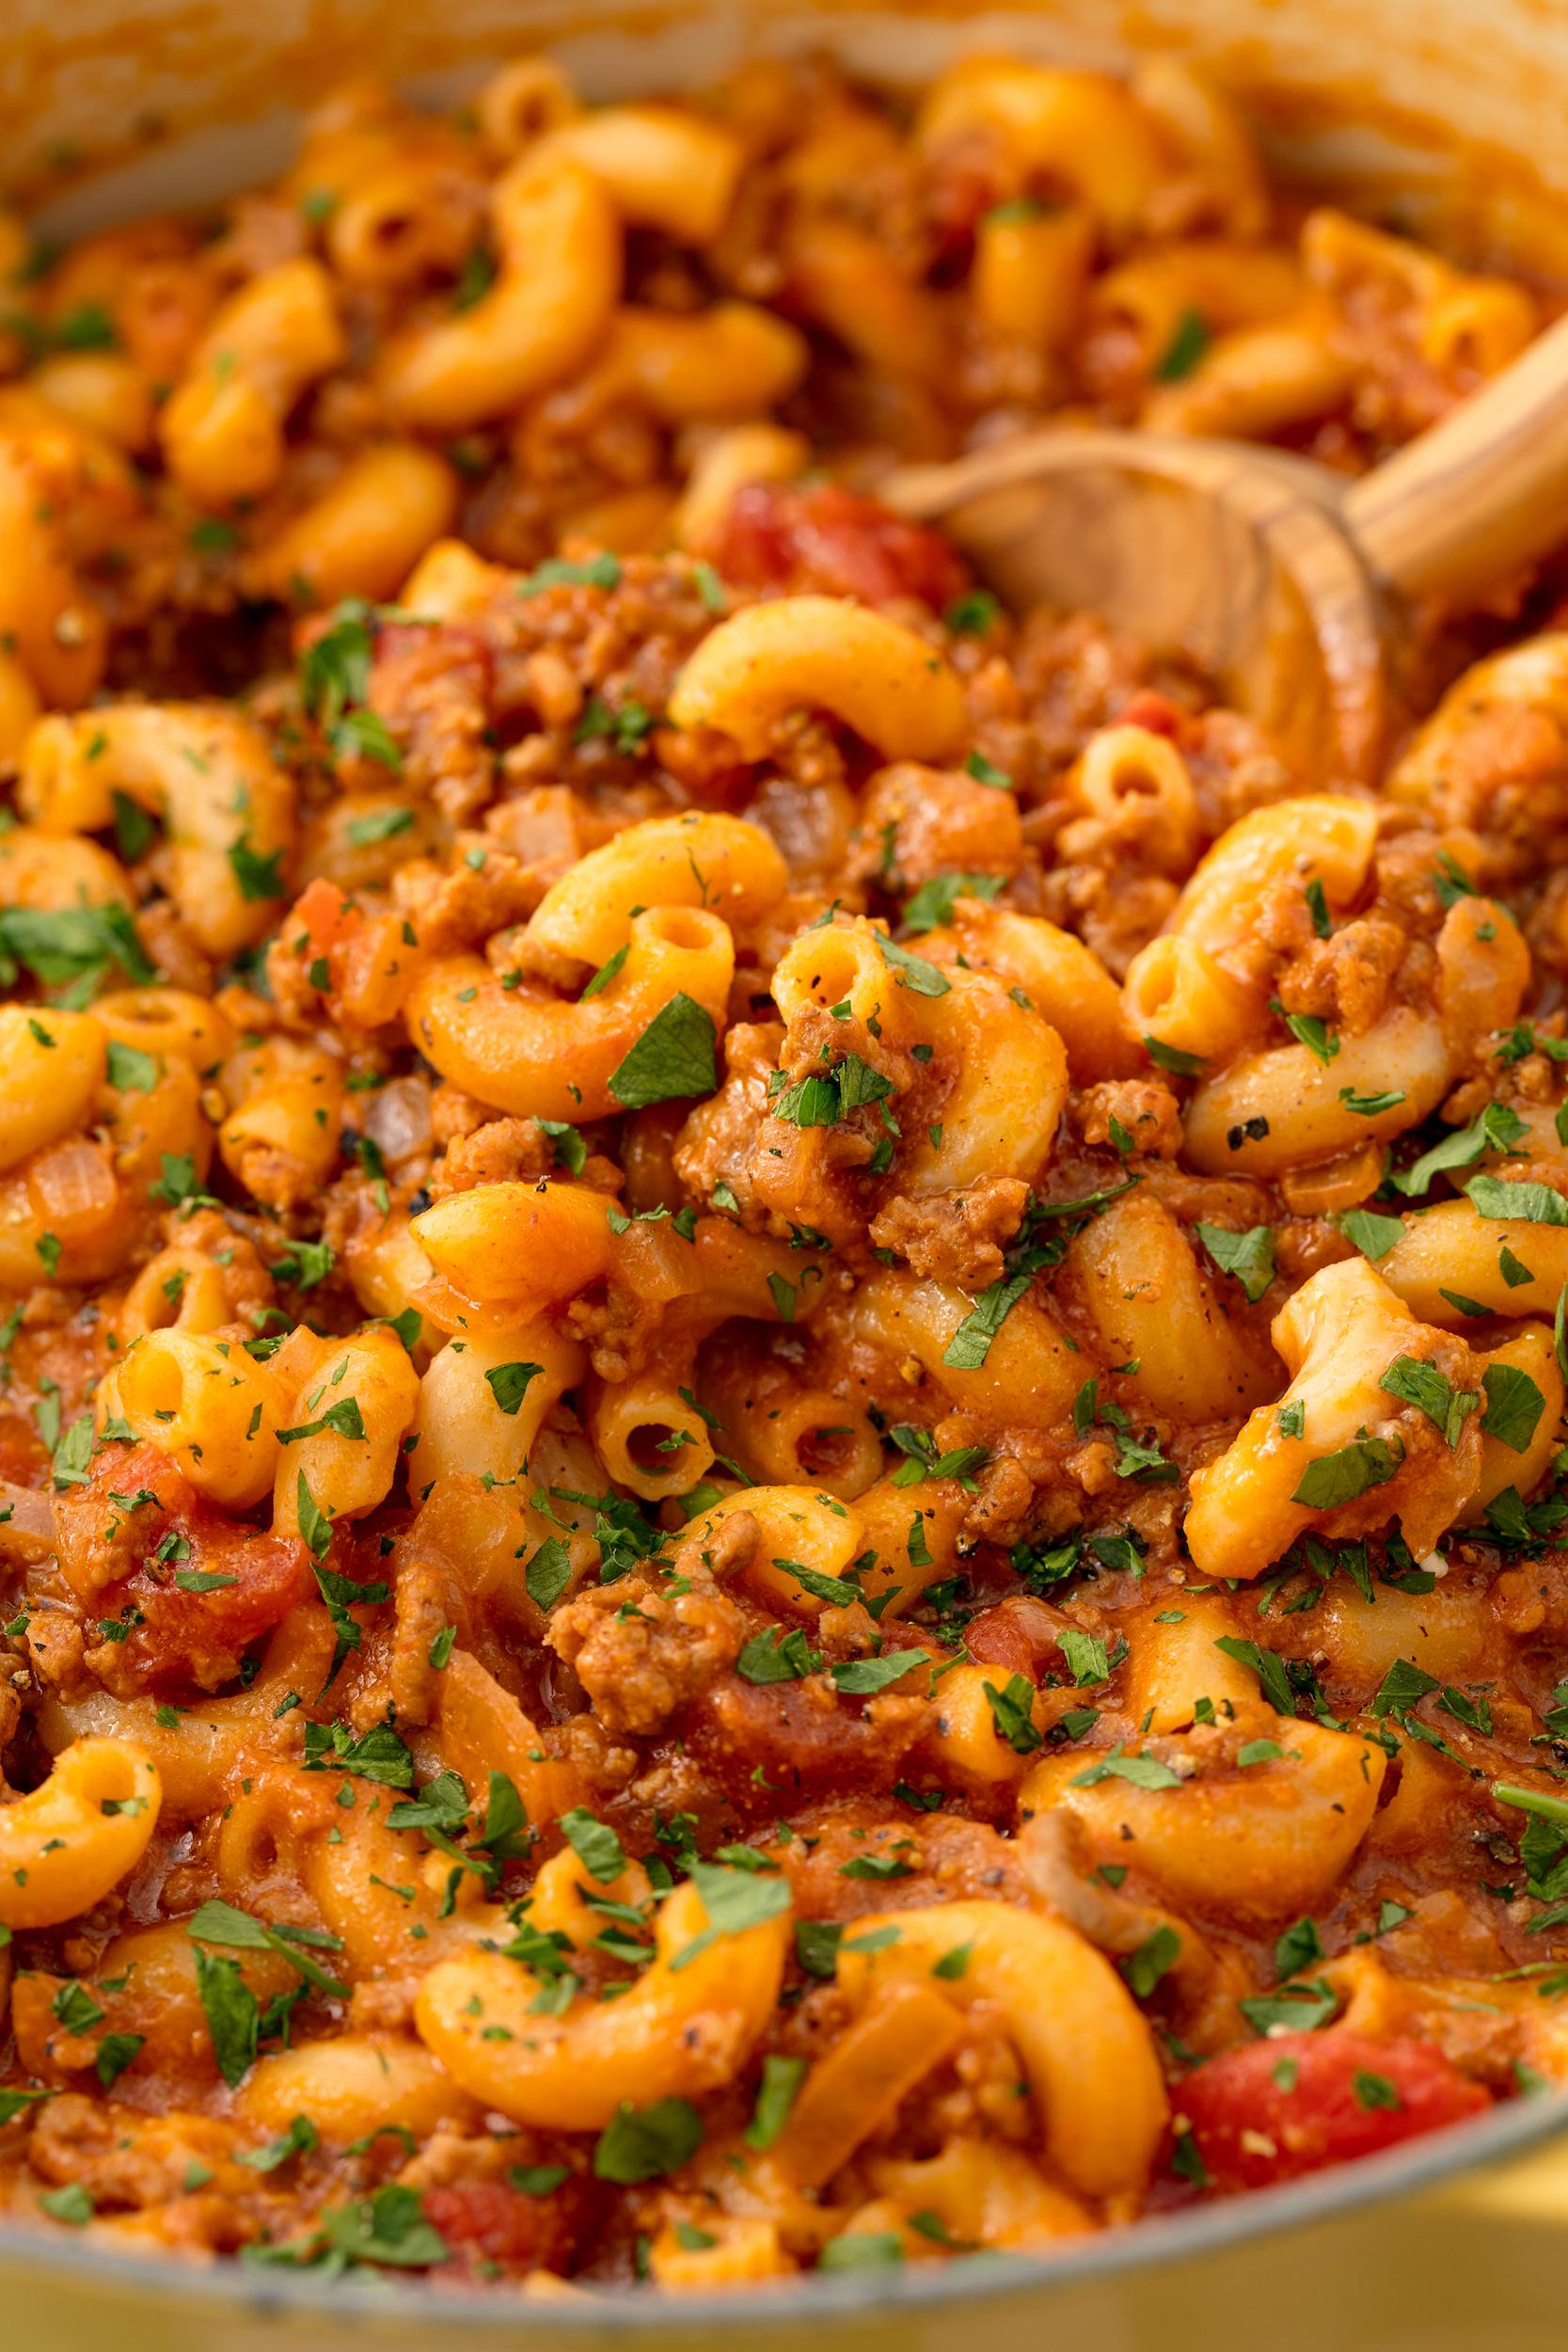 100+ One Skillet Dinner Recipes